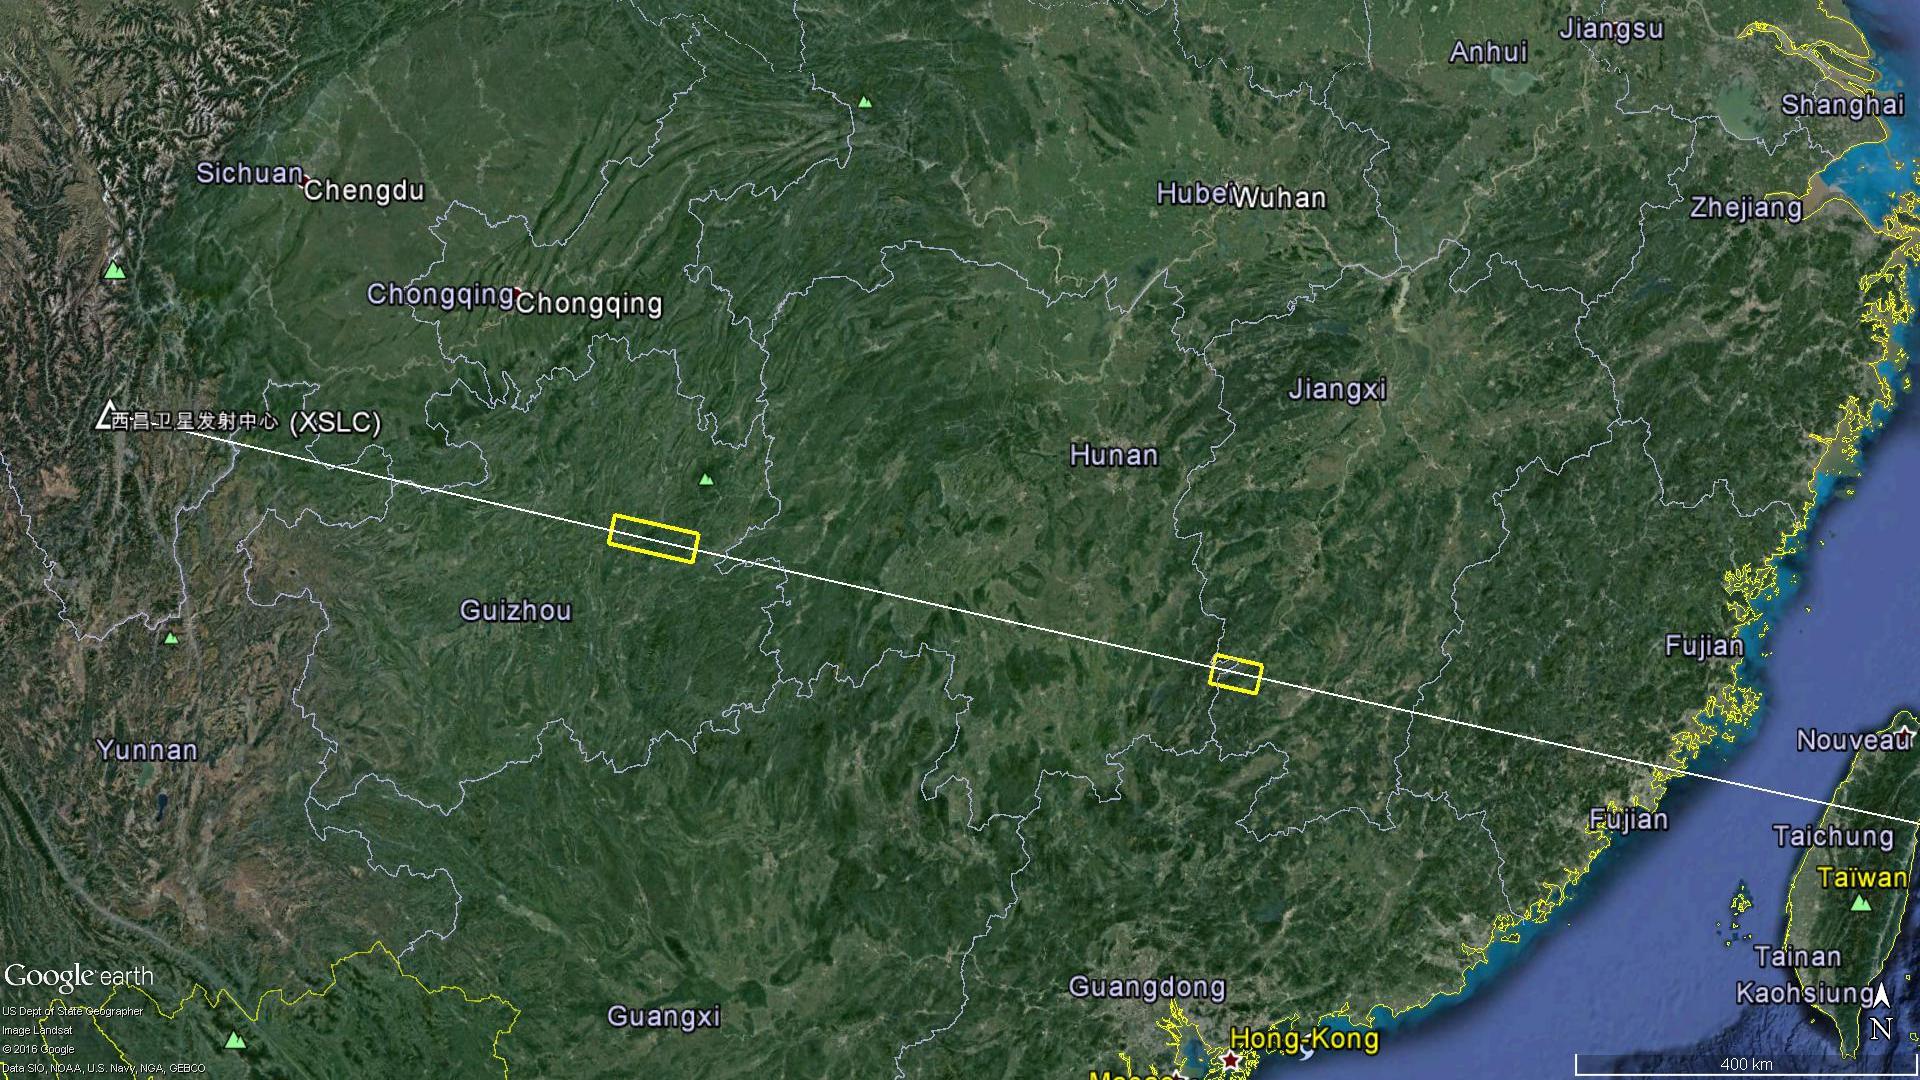 2016 08 05 - Lancement du satellite Tiantong-1-01 - 01